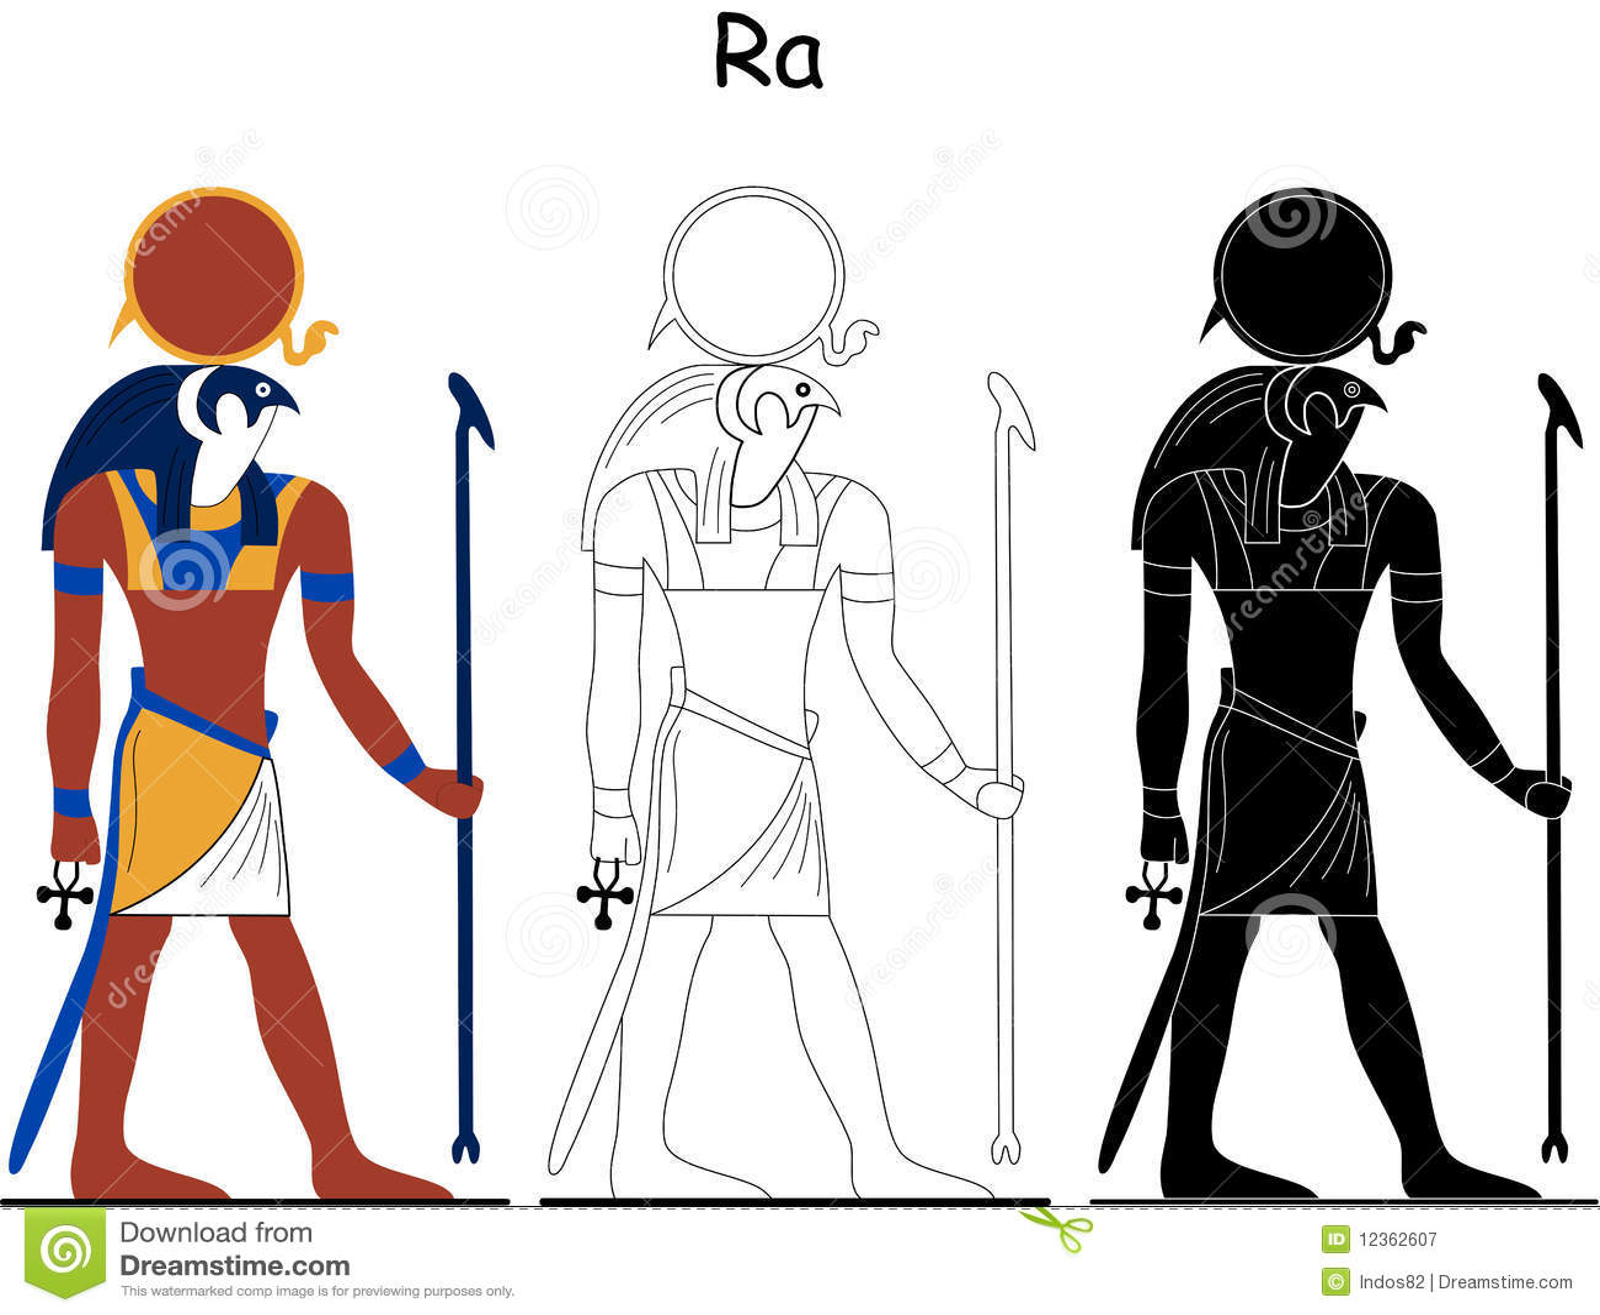 Ancient Egyptian God - Ra Royalty Free Stock Photography - Image ...